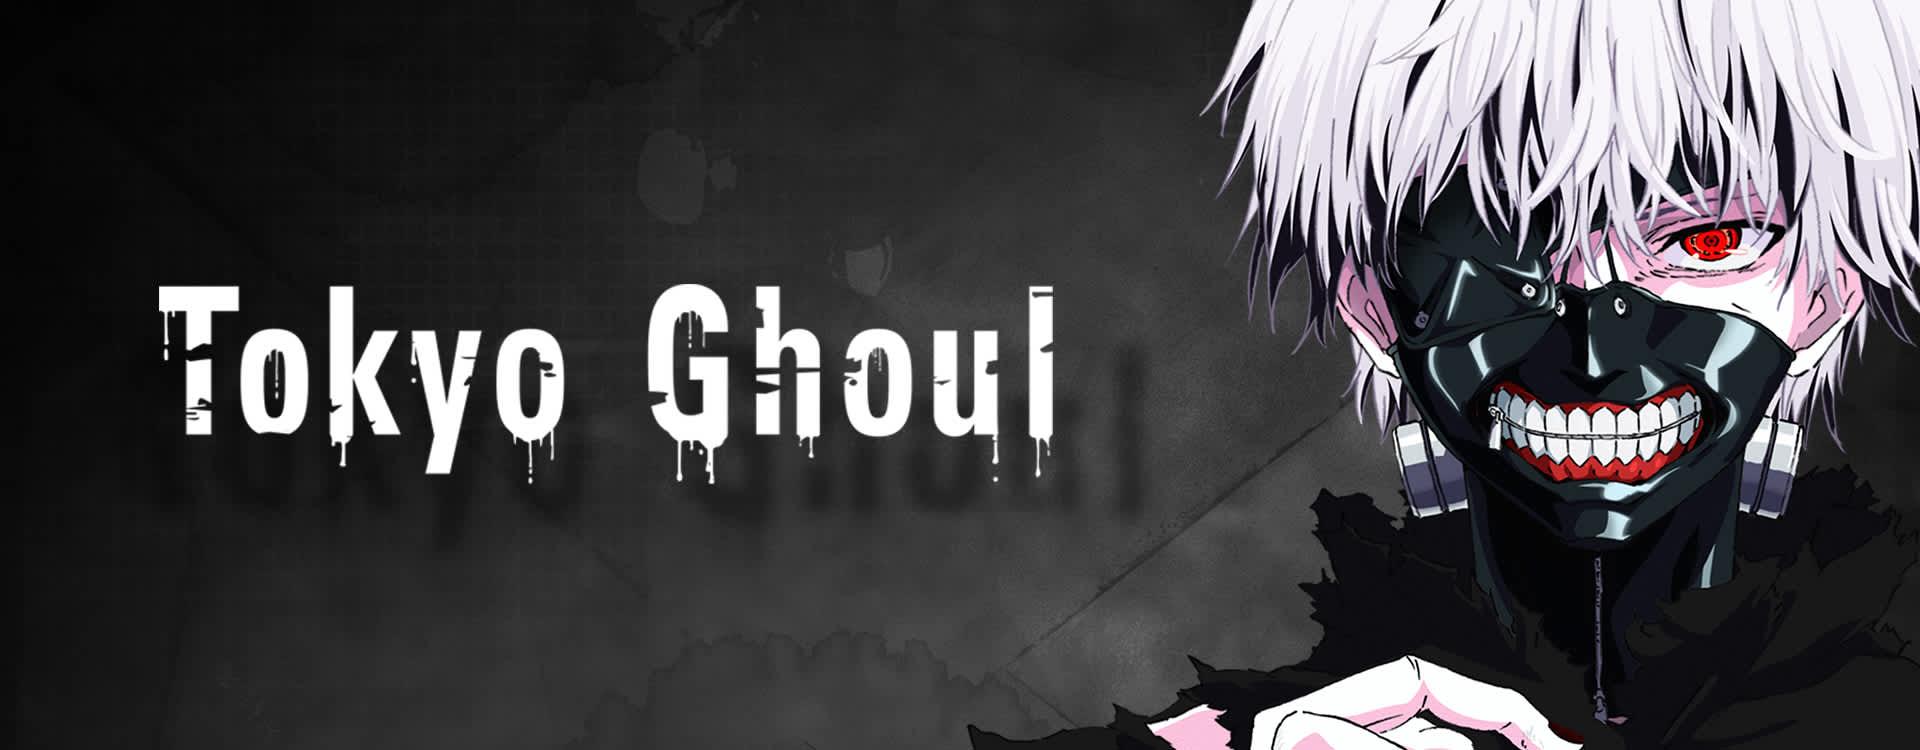 Tokyo ghoul saison 2 torrent fr